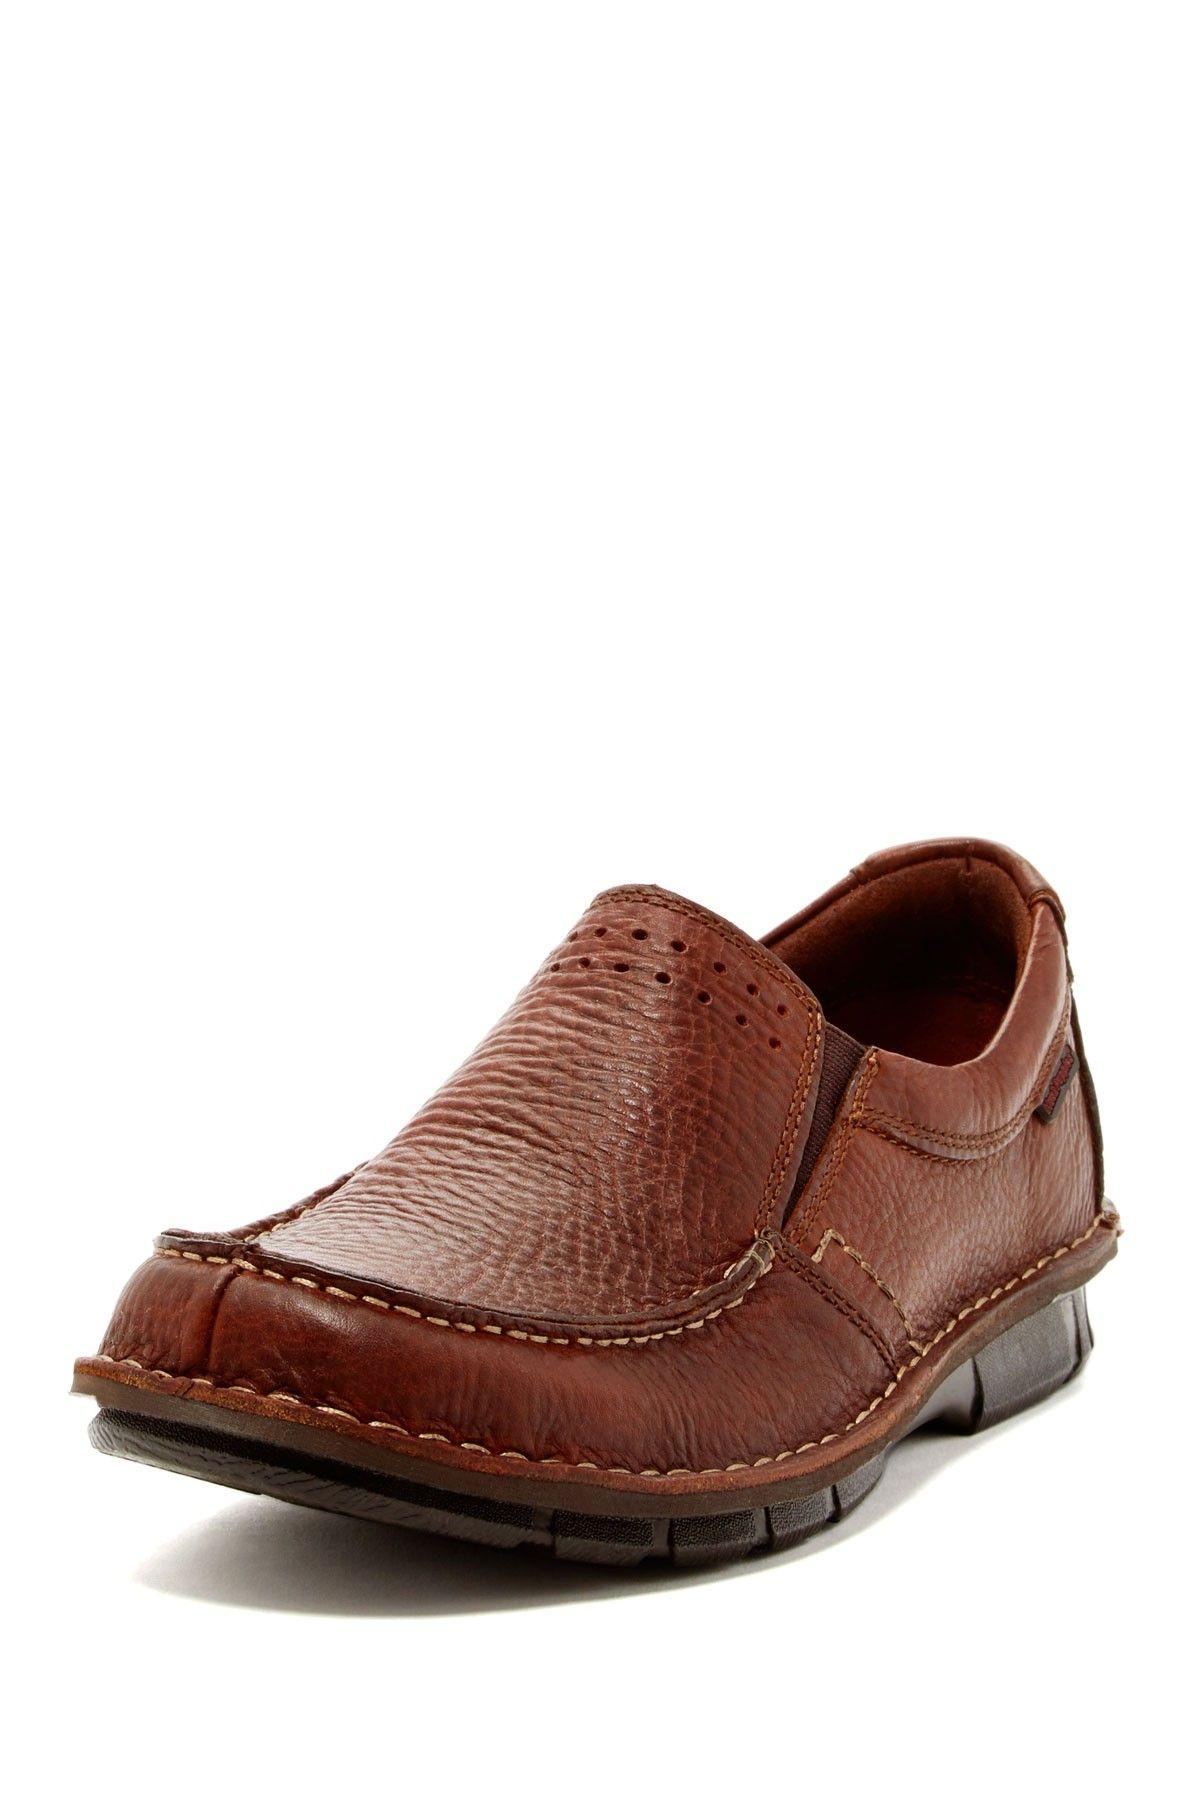 Hush Puppies Montrose Slip On Casual Shoe Men Shoes Mens Casual Shoes Casual Shoes Hush Puppies